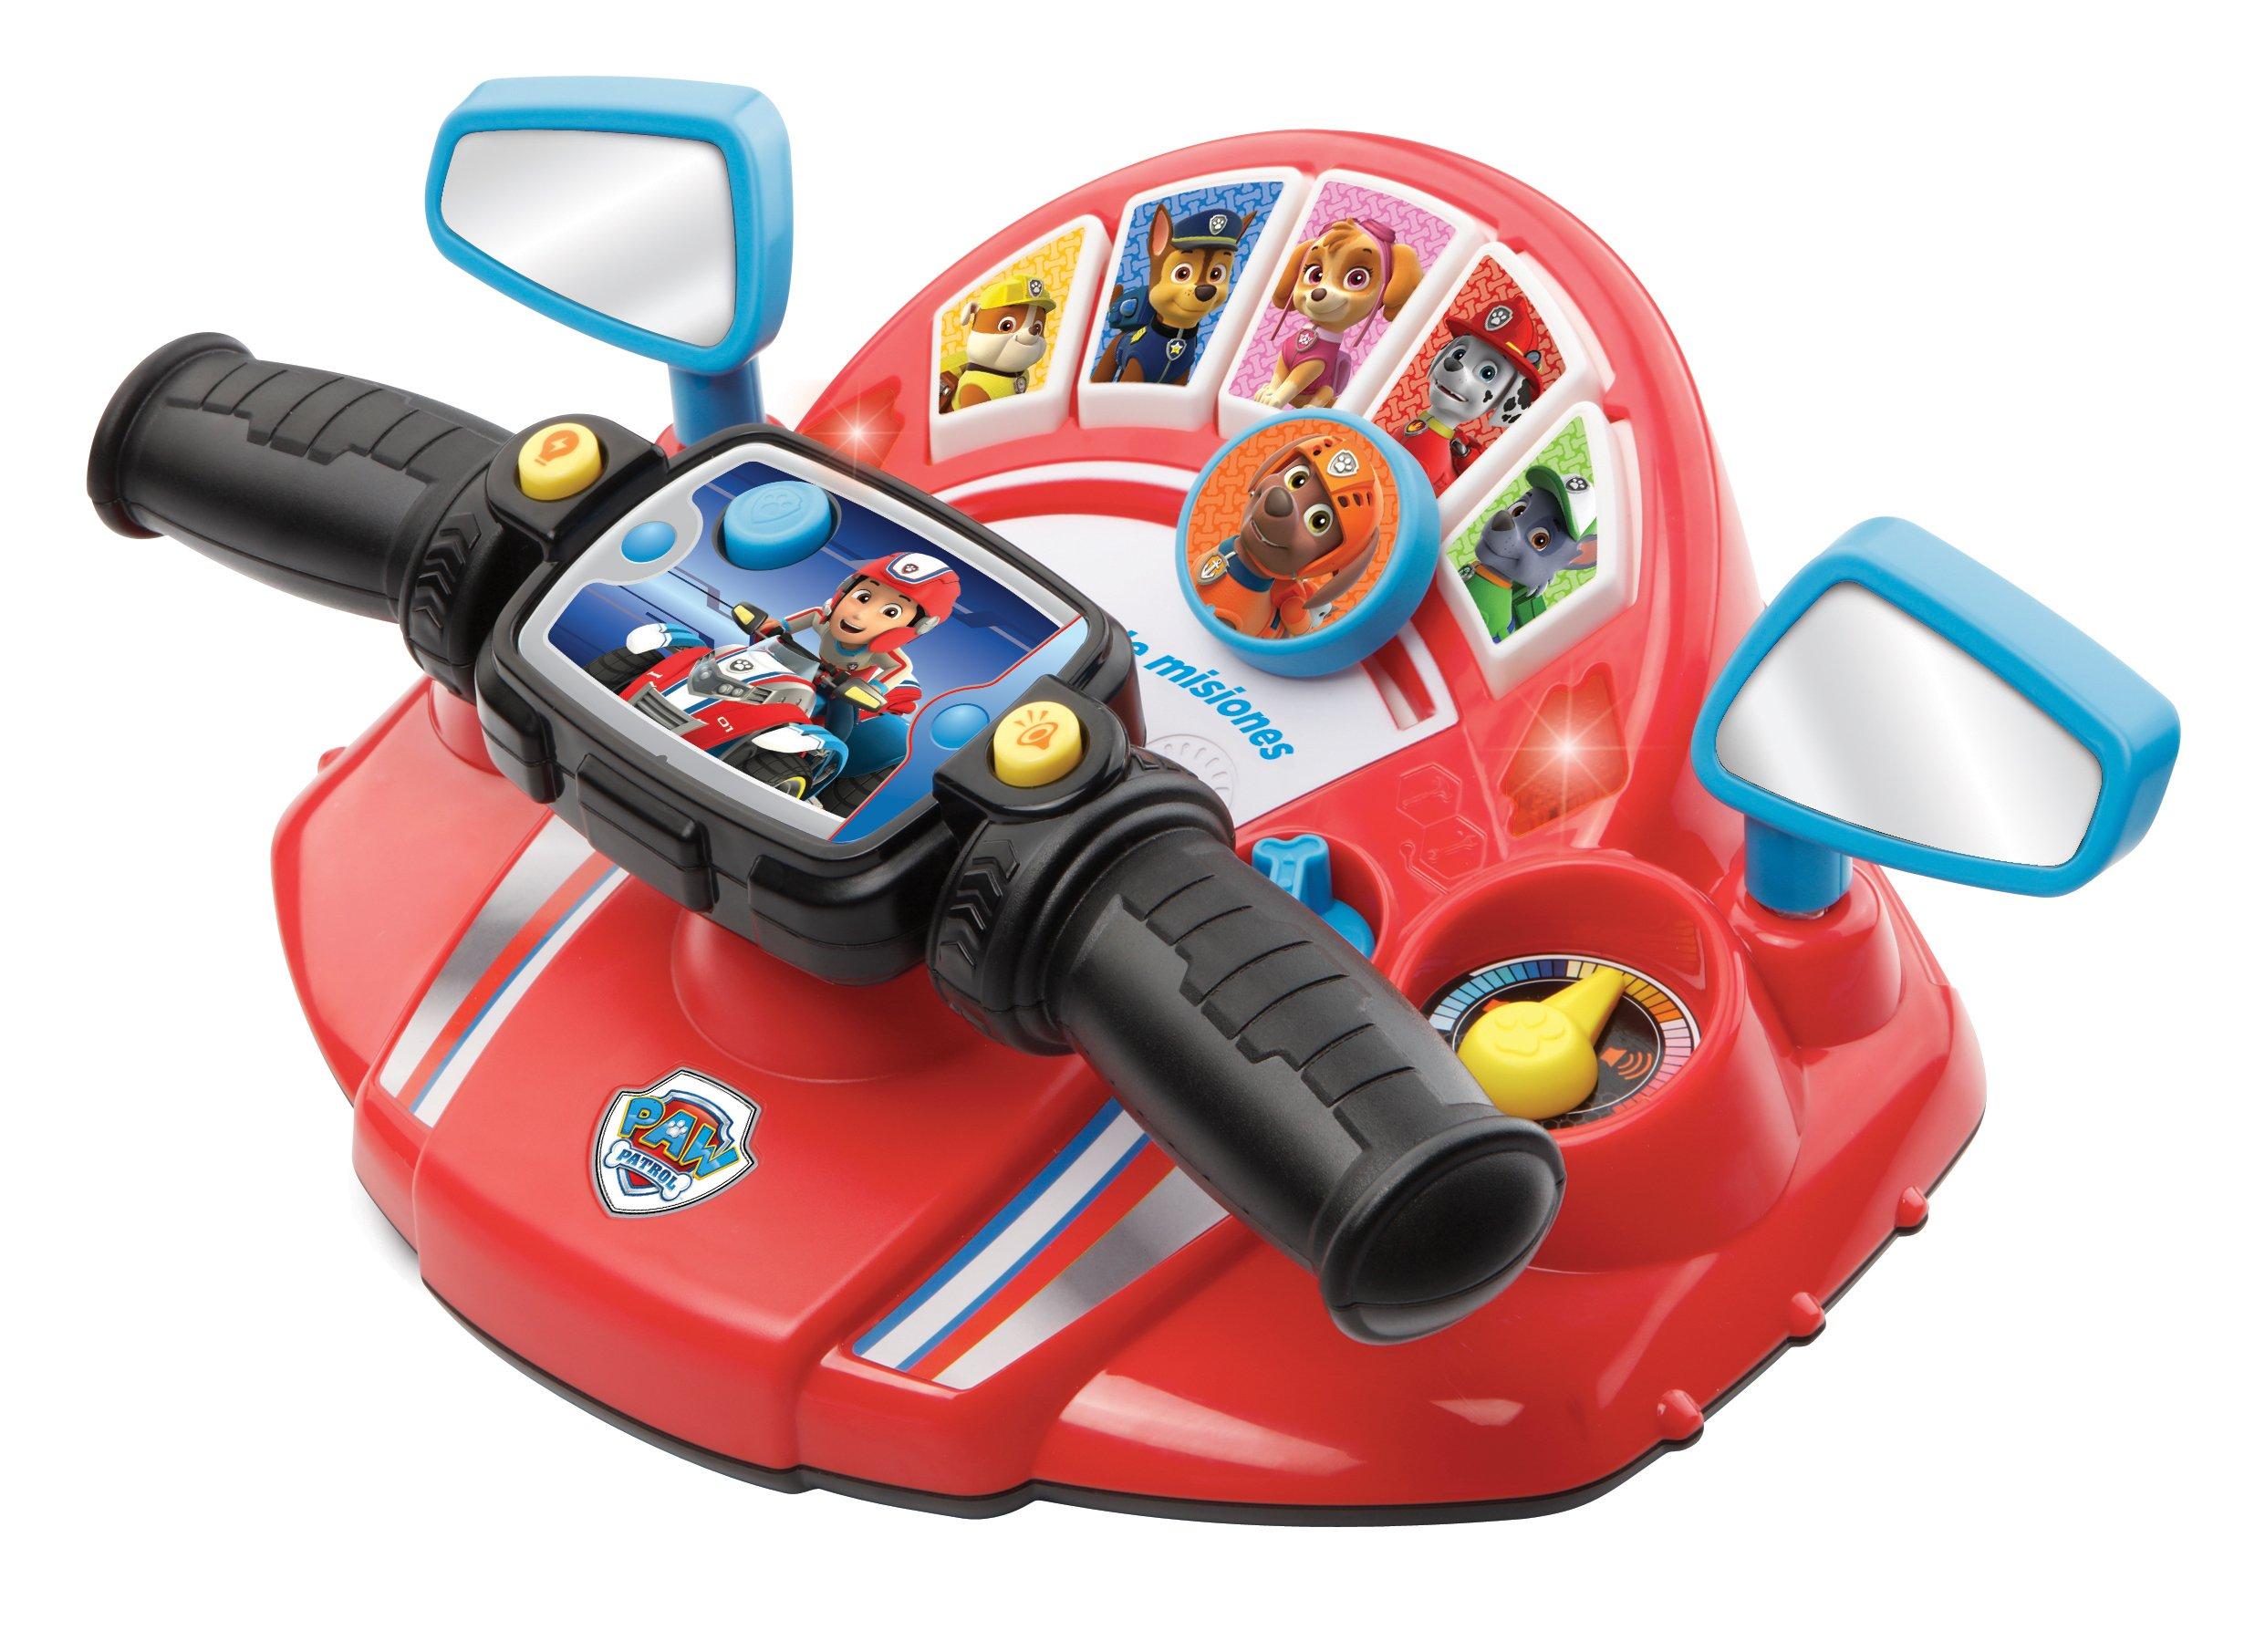 VTech Disney Simulador de conducción de Patrulla Canina 3480-190222 product image